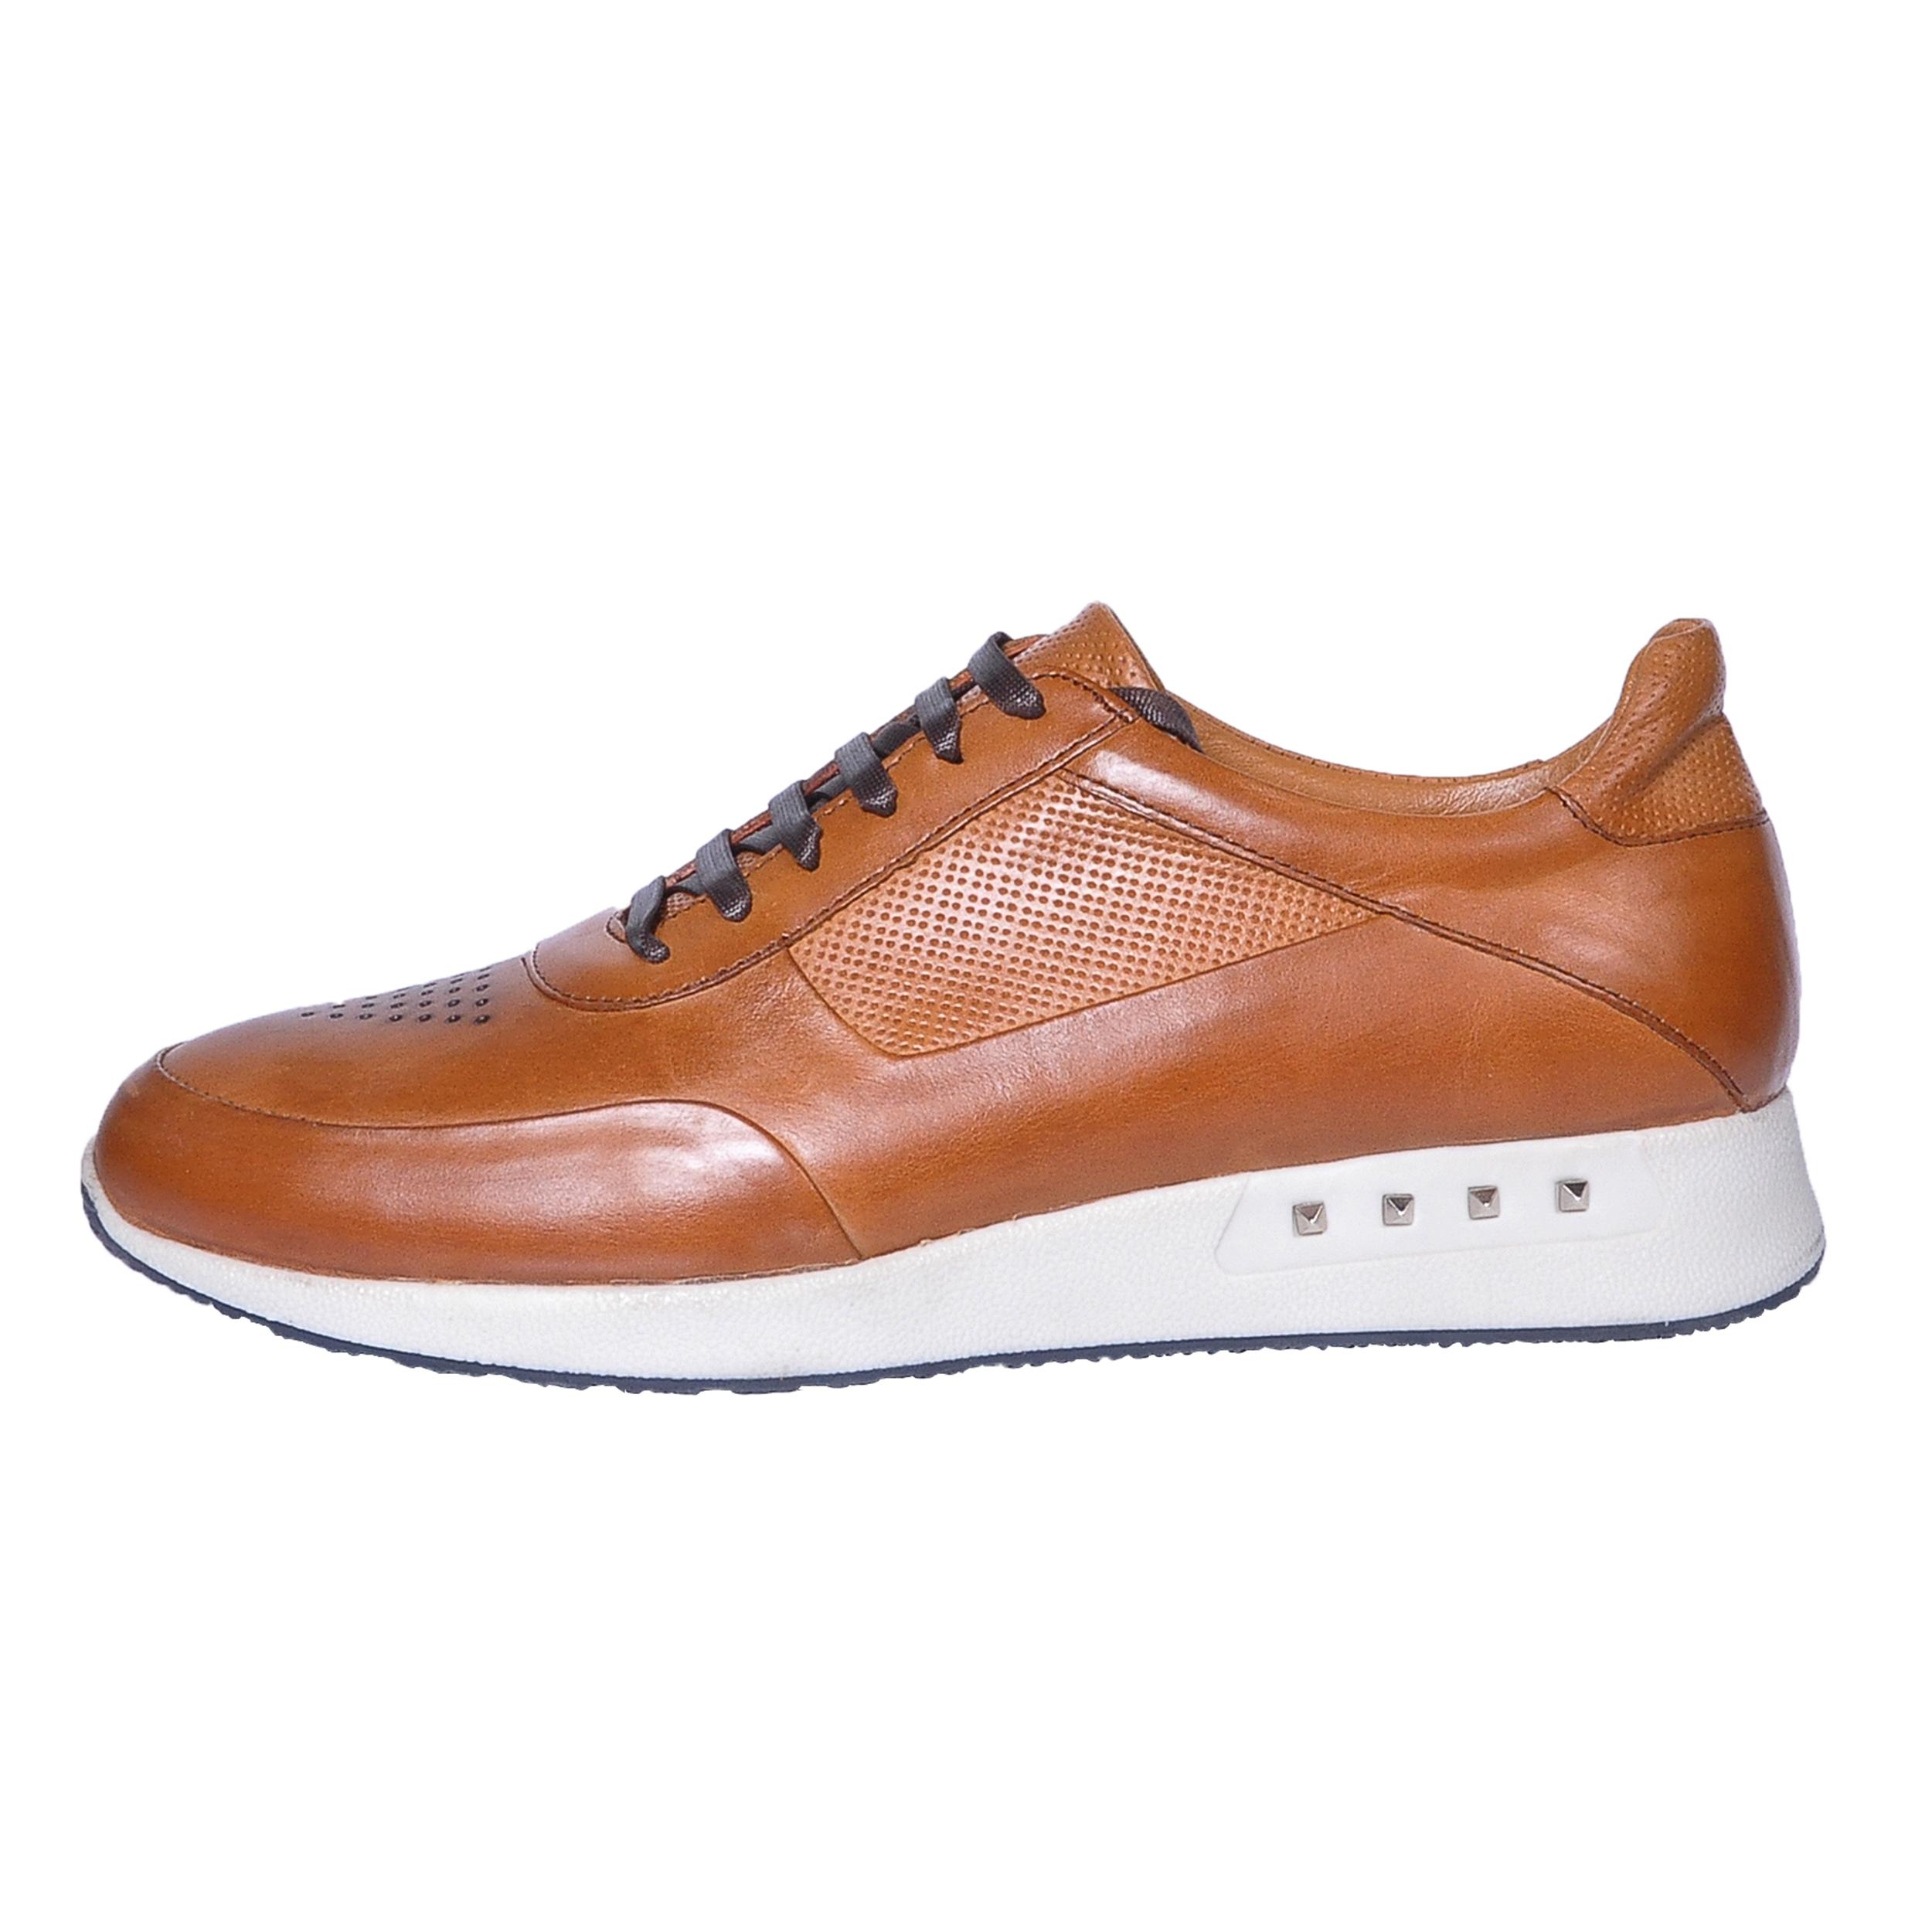 کفش روزمره مردانه مدل m408m